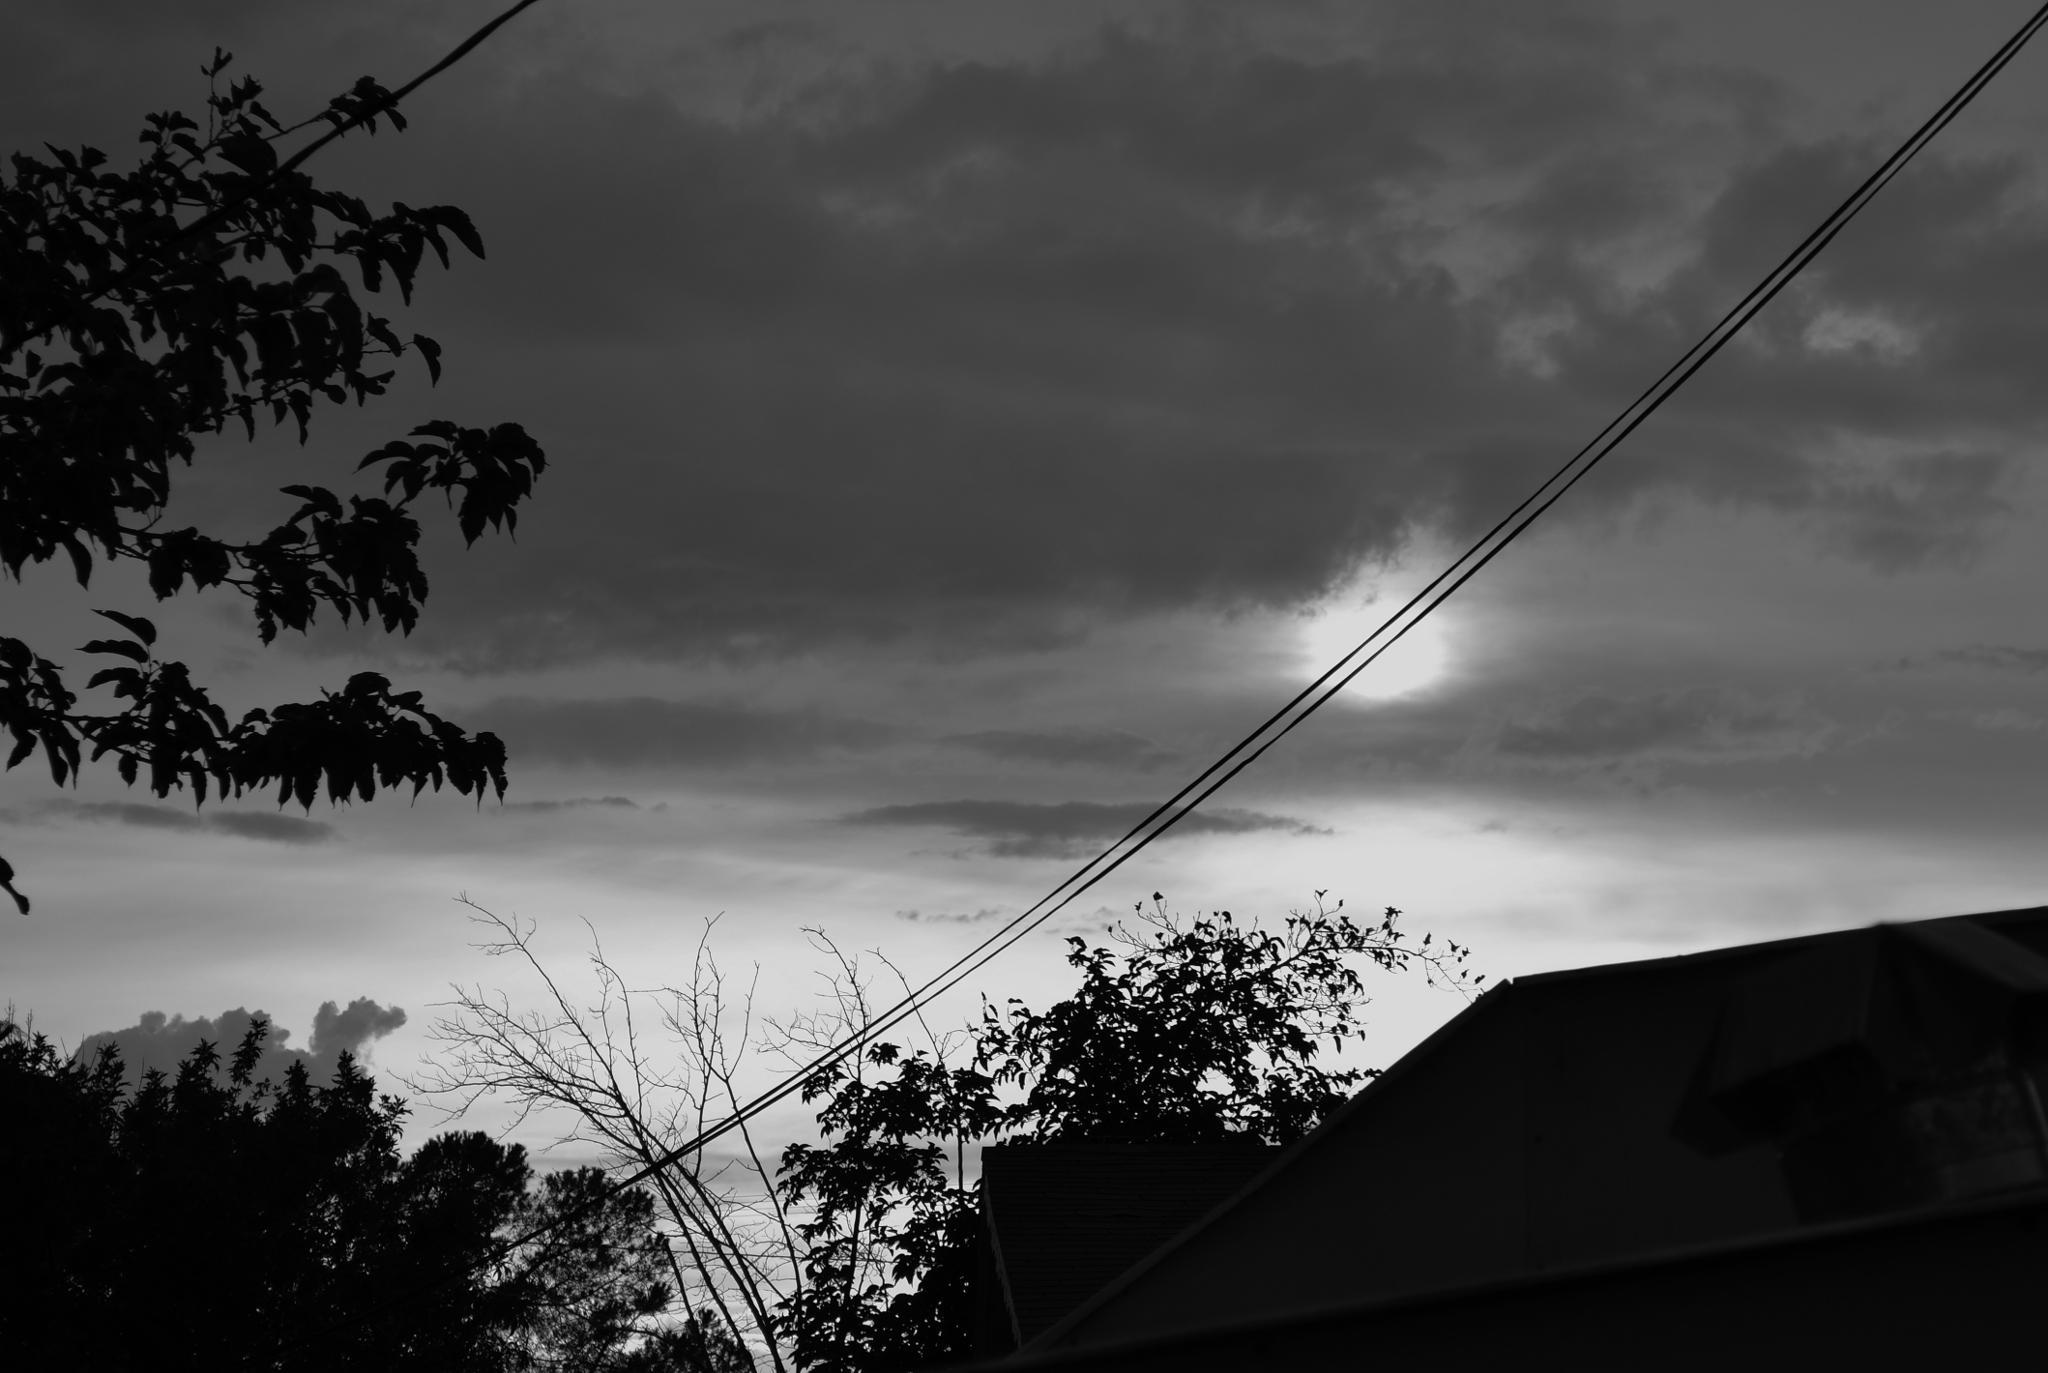 Stormy by Linda Masanimptewa